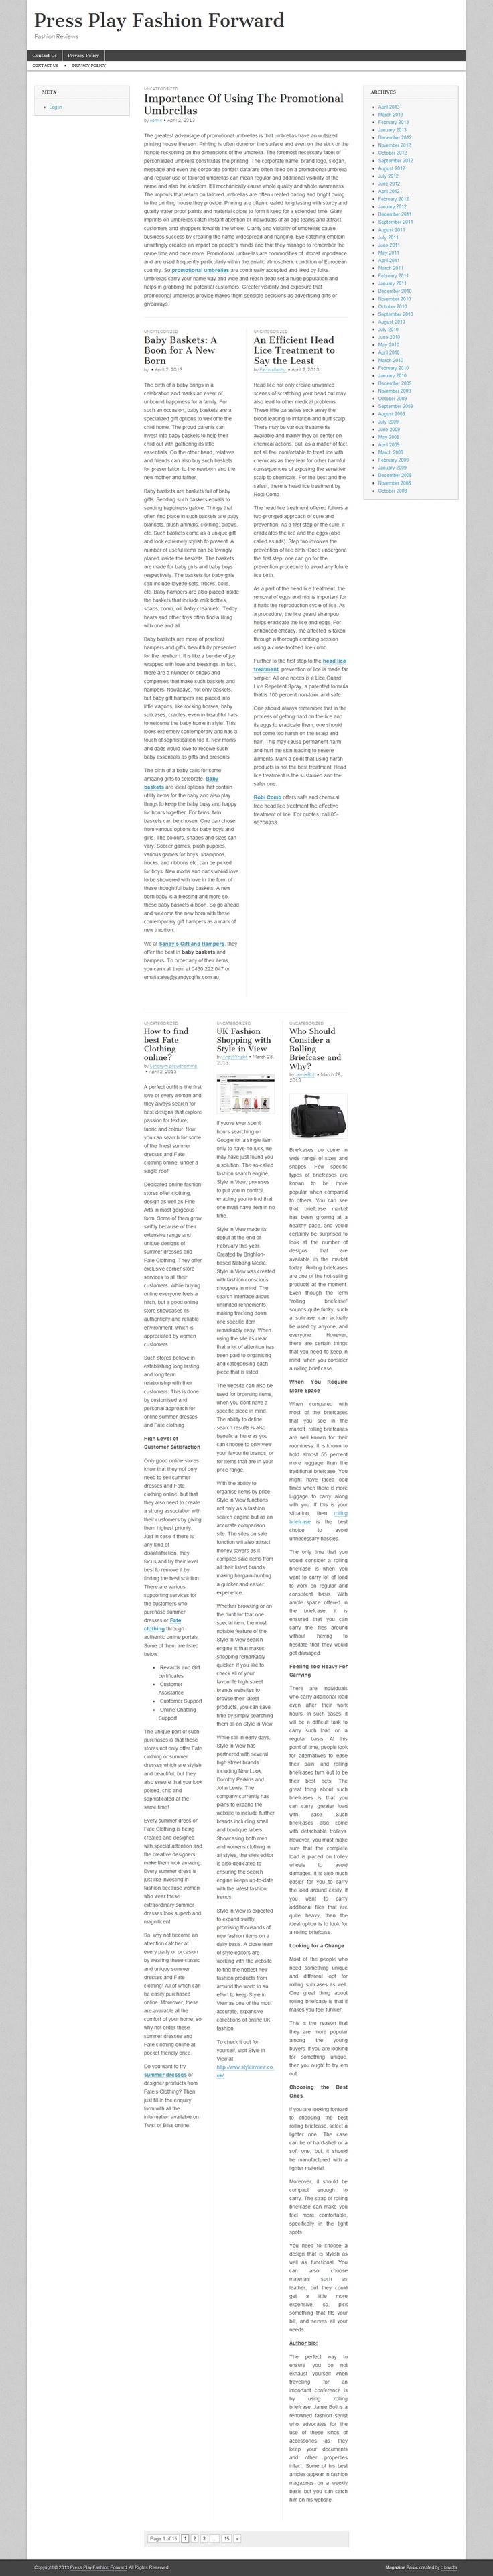 Fashion reviews and insights >> fashion --> http://pressplayfashionforward.com